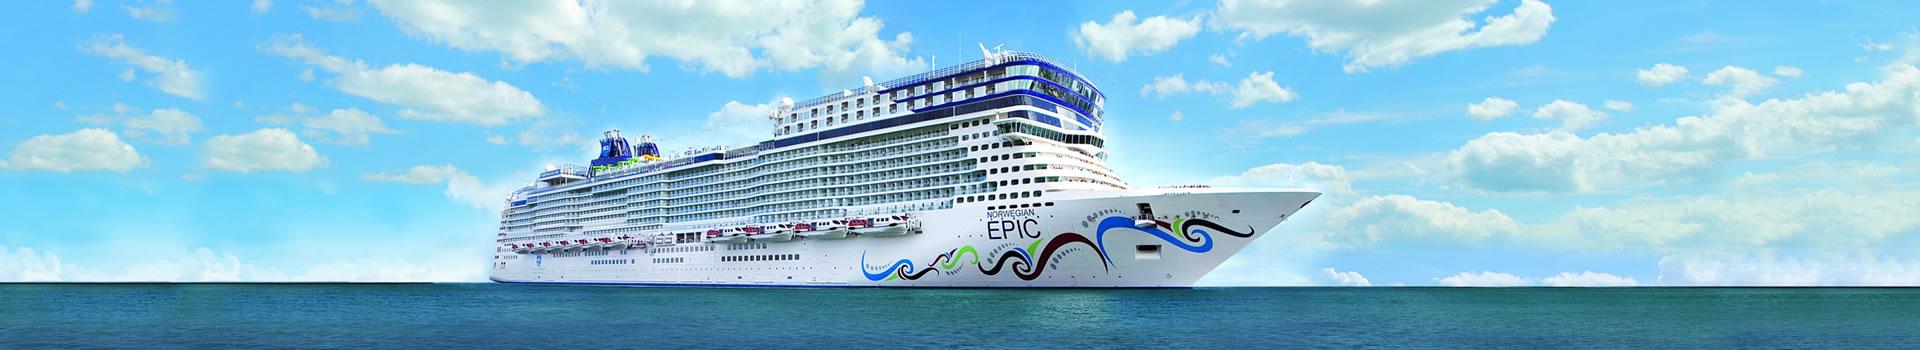 crucero epic mediterraneo